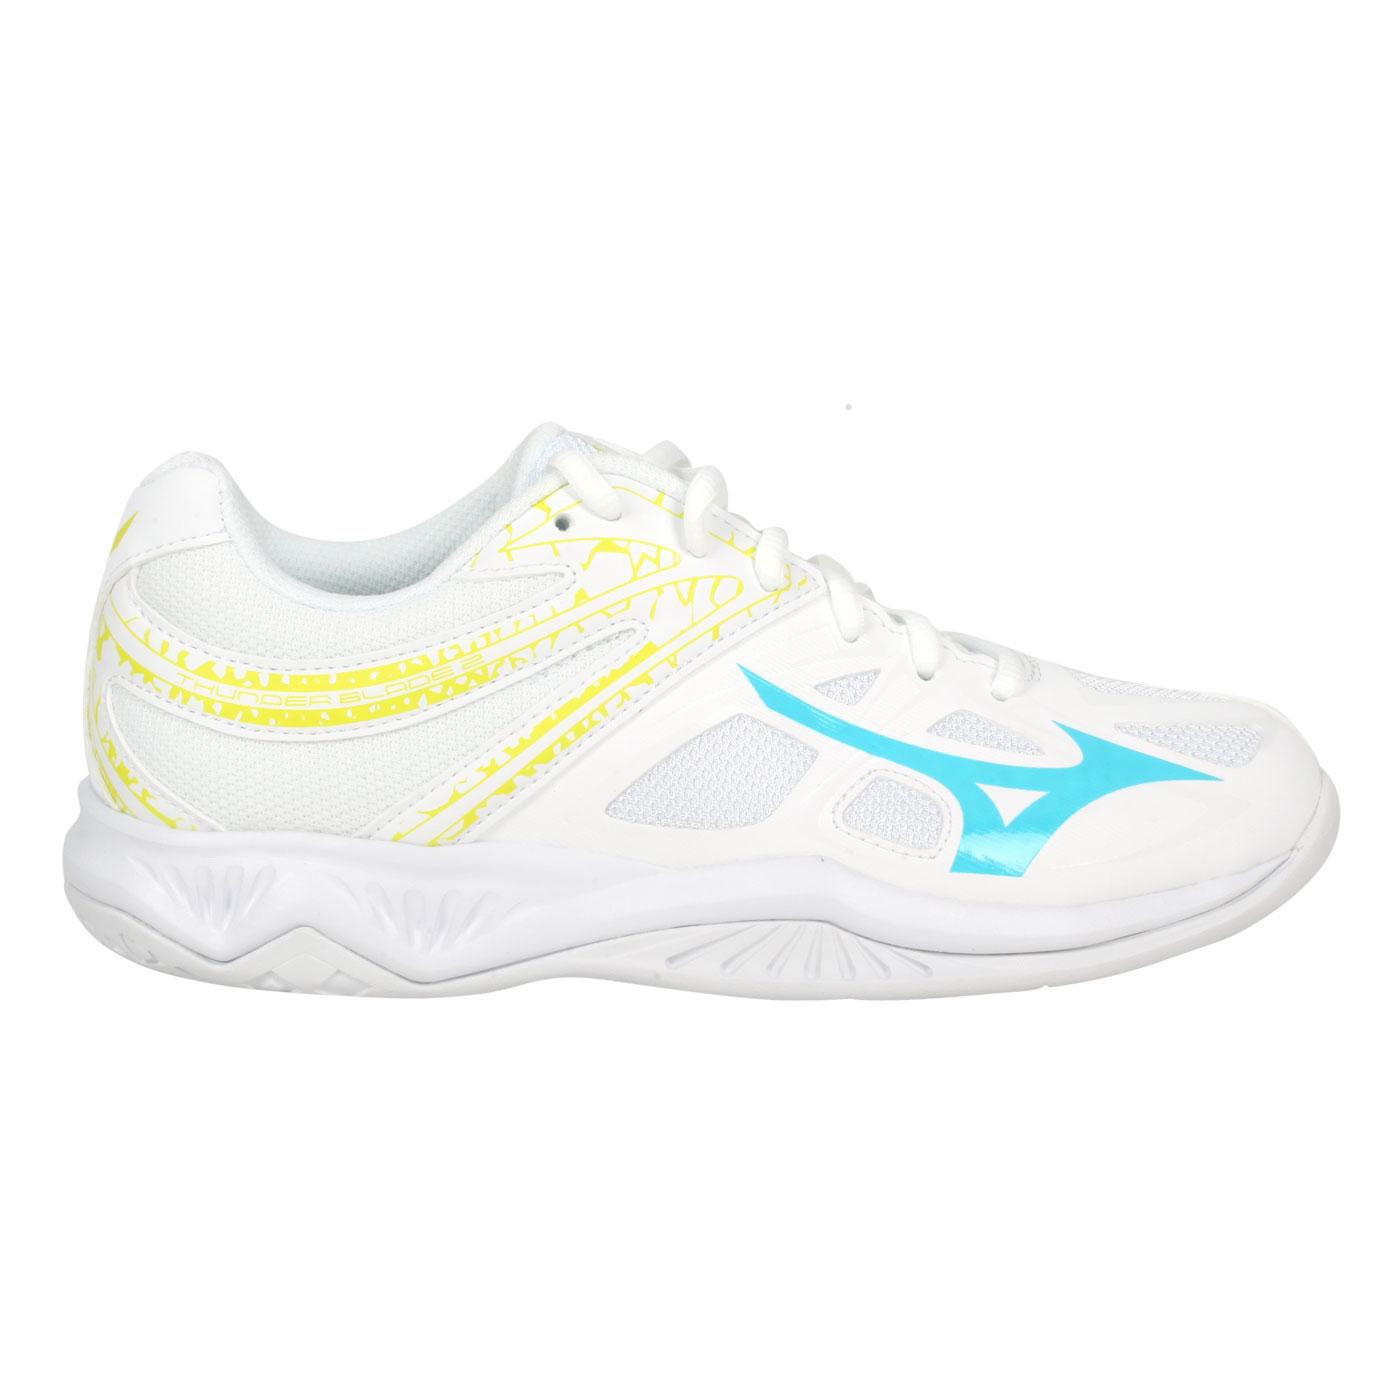 MIZUNO 女款排球鞋  @THUNDER BLADE 2@V1GA197022 - 白黃藍